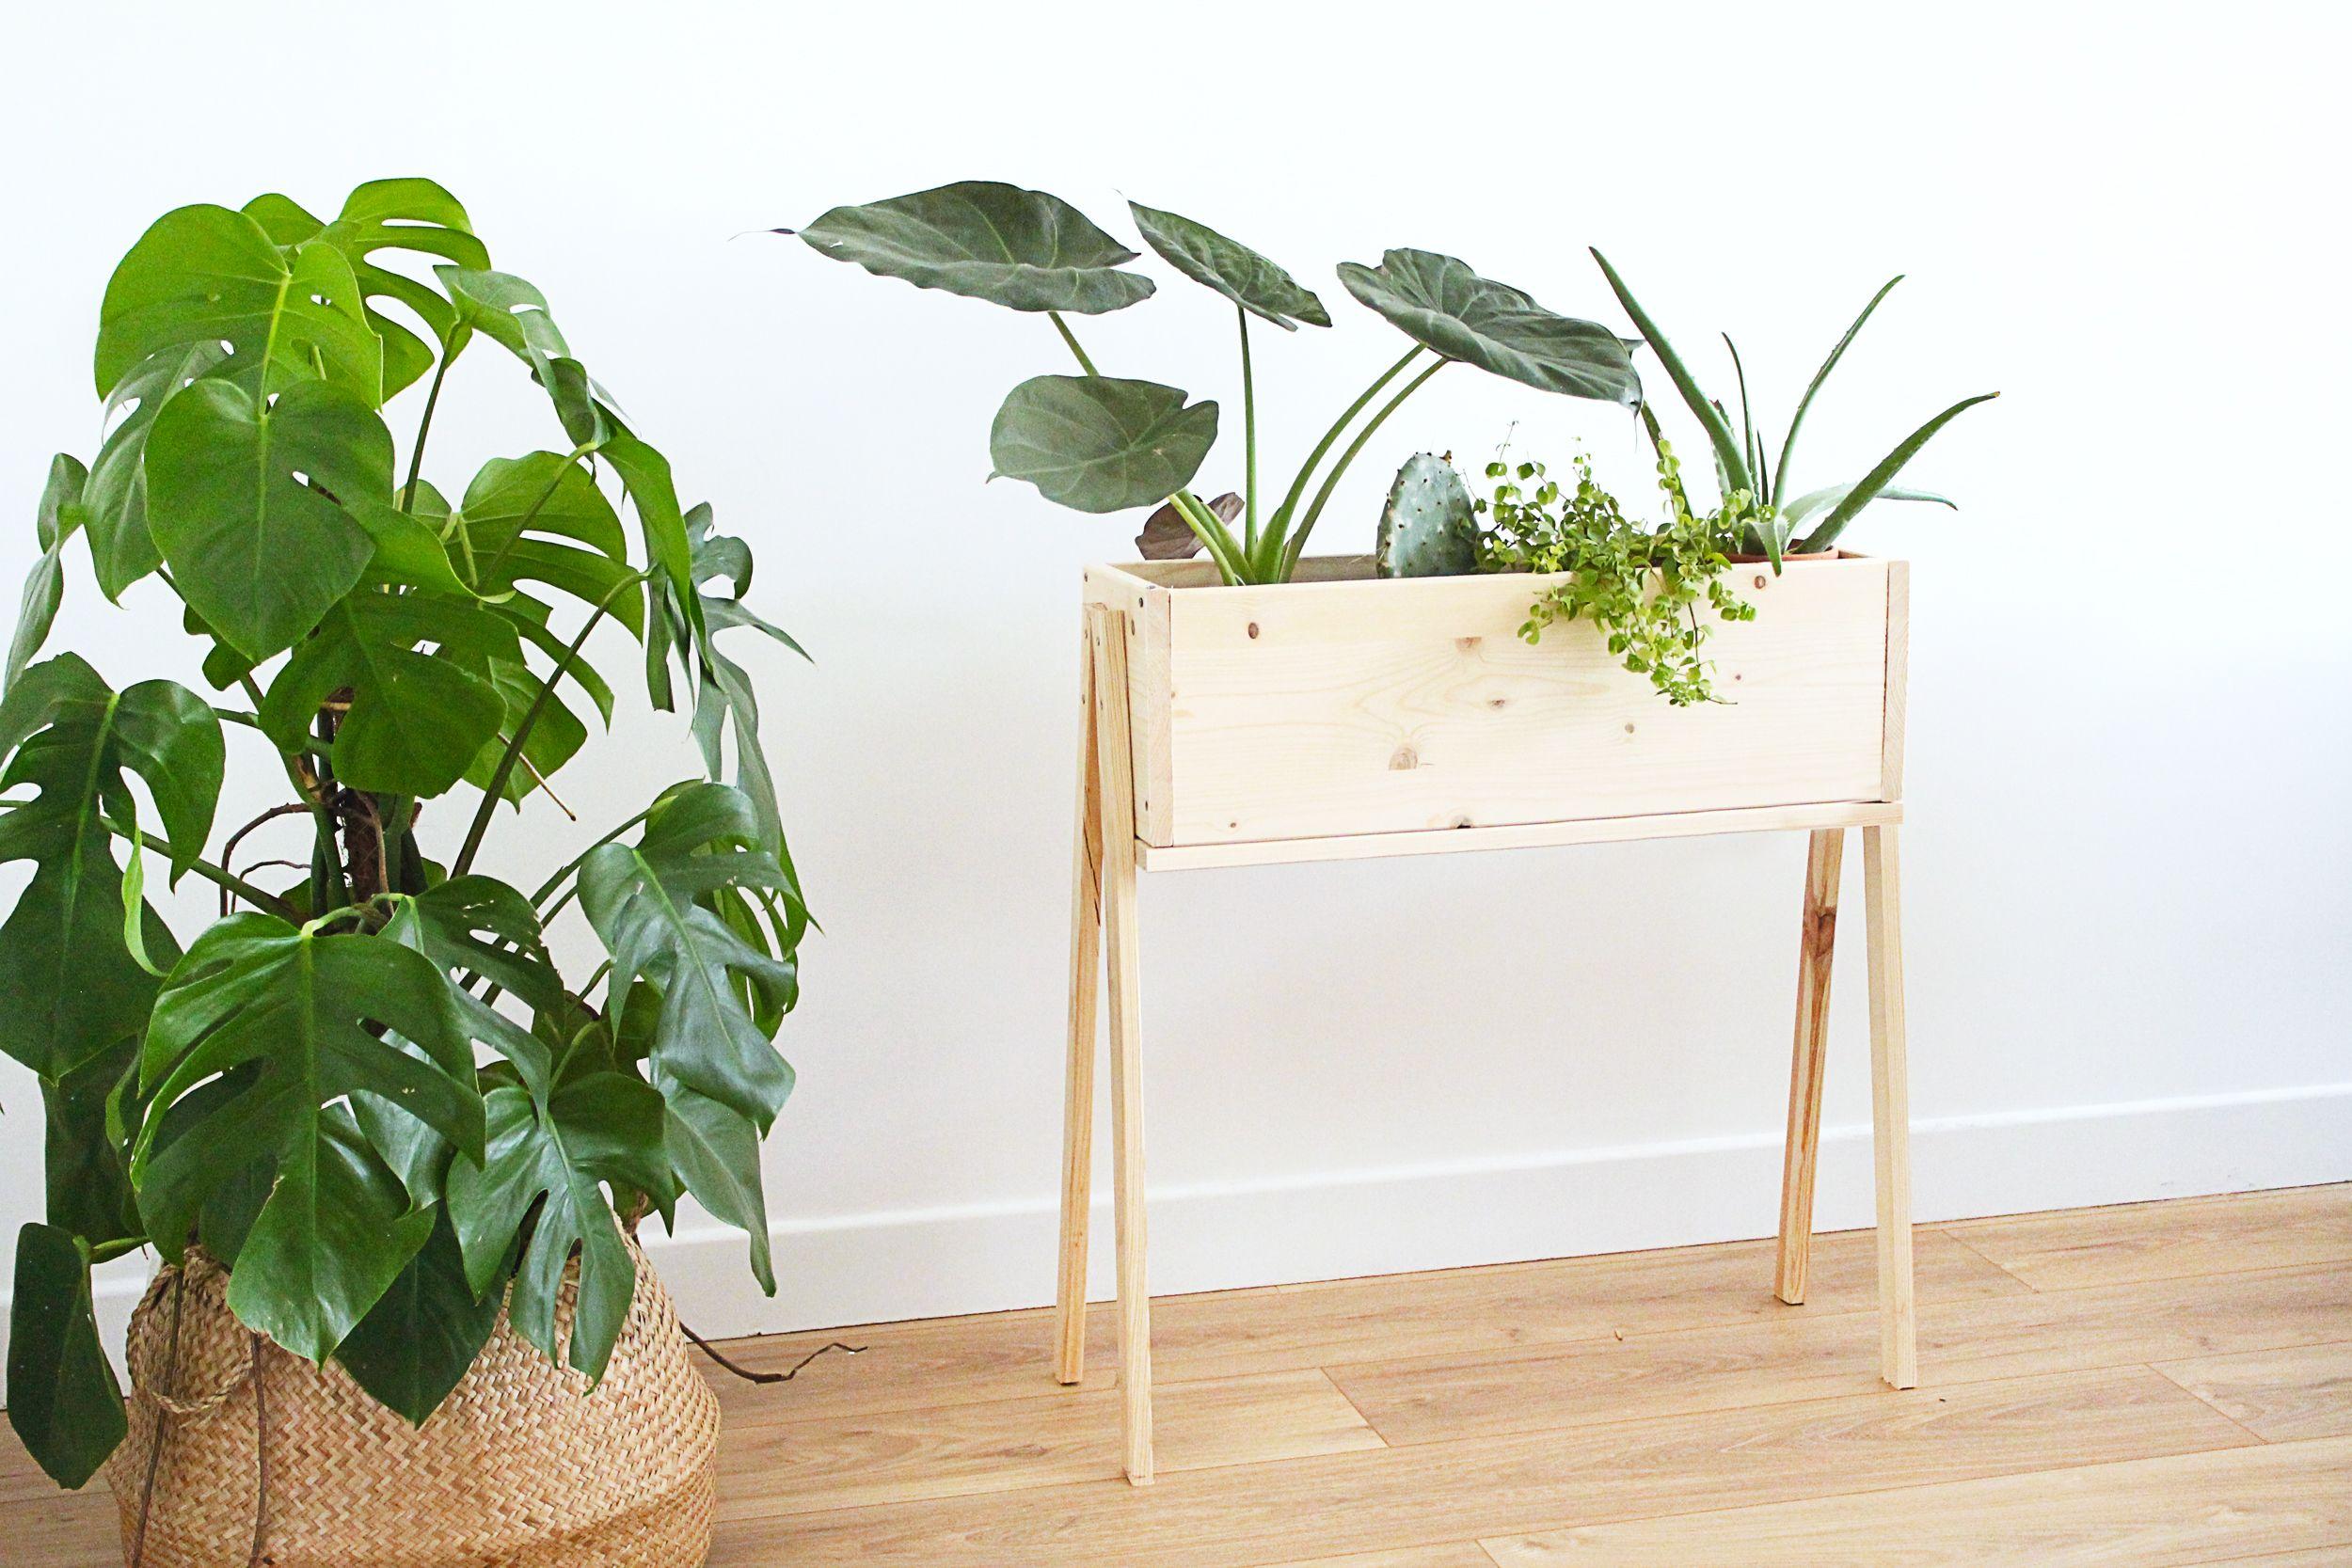 diy une jardiniere sur pieds en bois diy diy m bel m bel et balkon. Black Bedroom Furniture Sets. Home Design Ideas